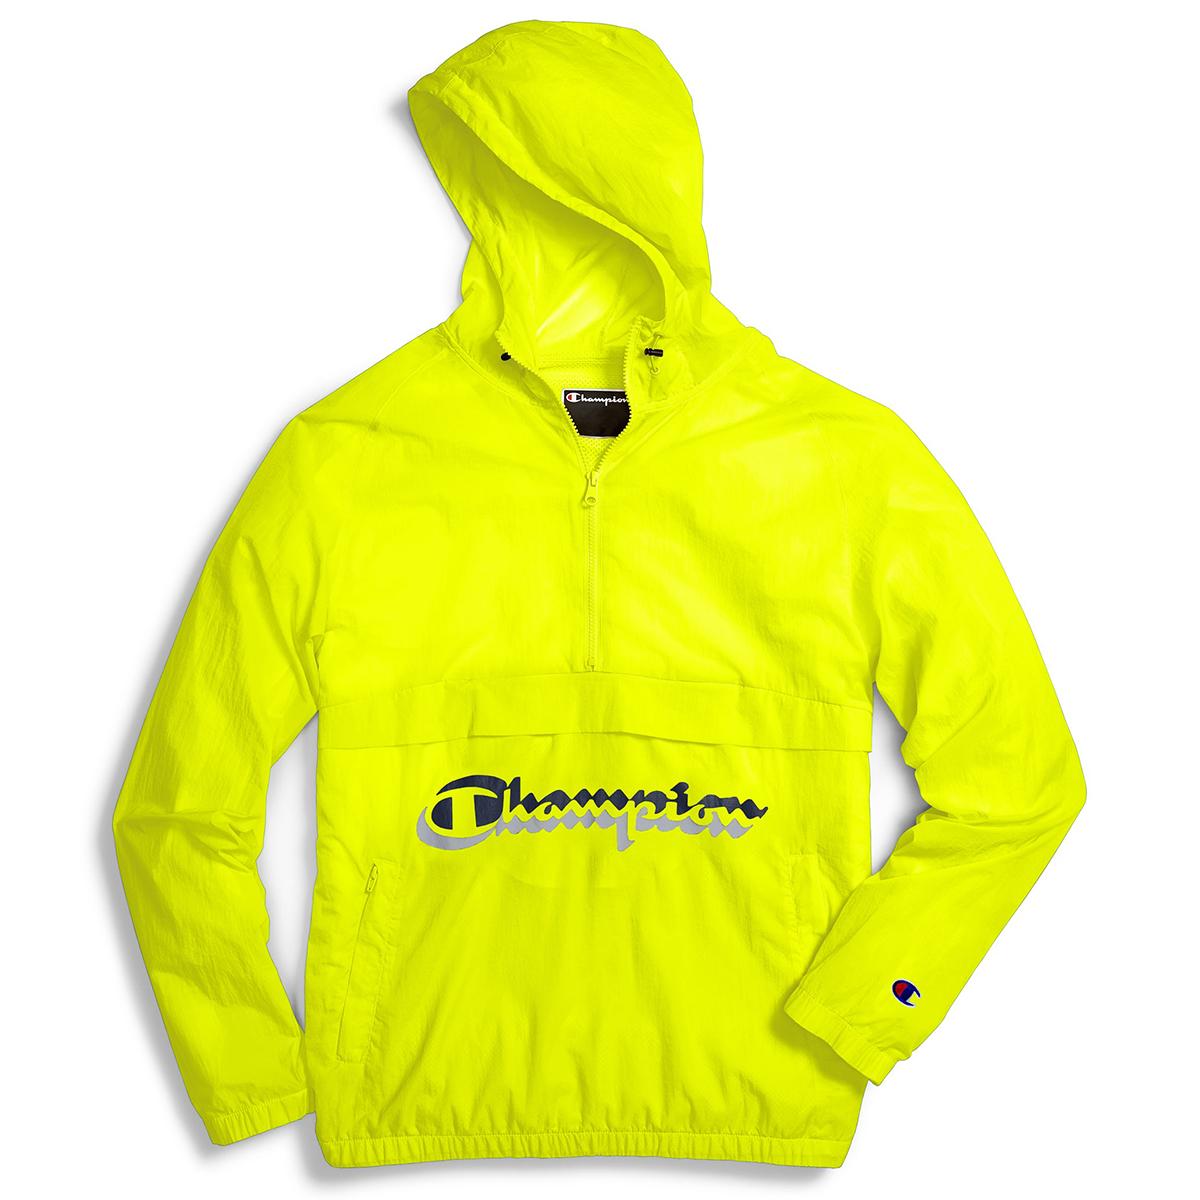 Champion Men's Packable Anorak Jacket - Yellow, M